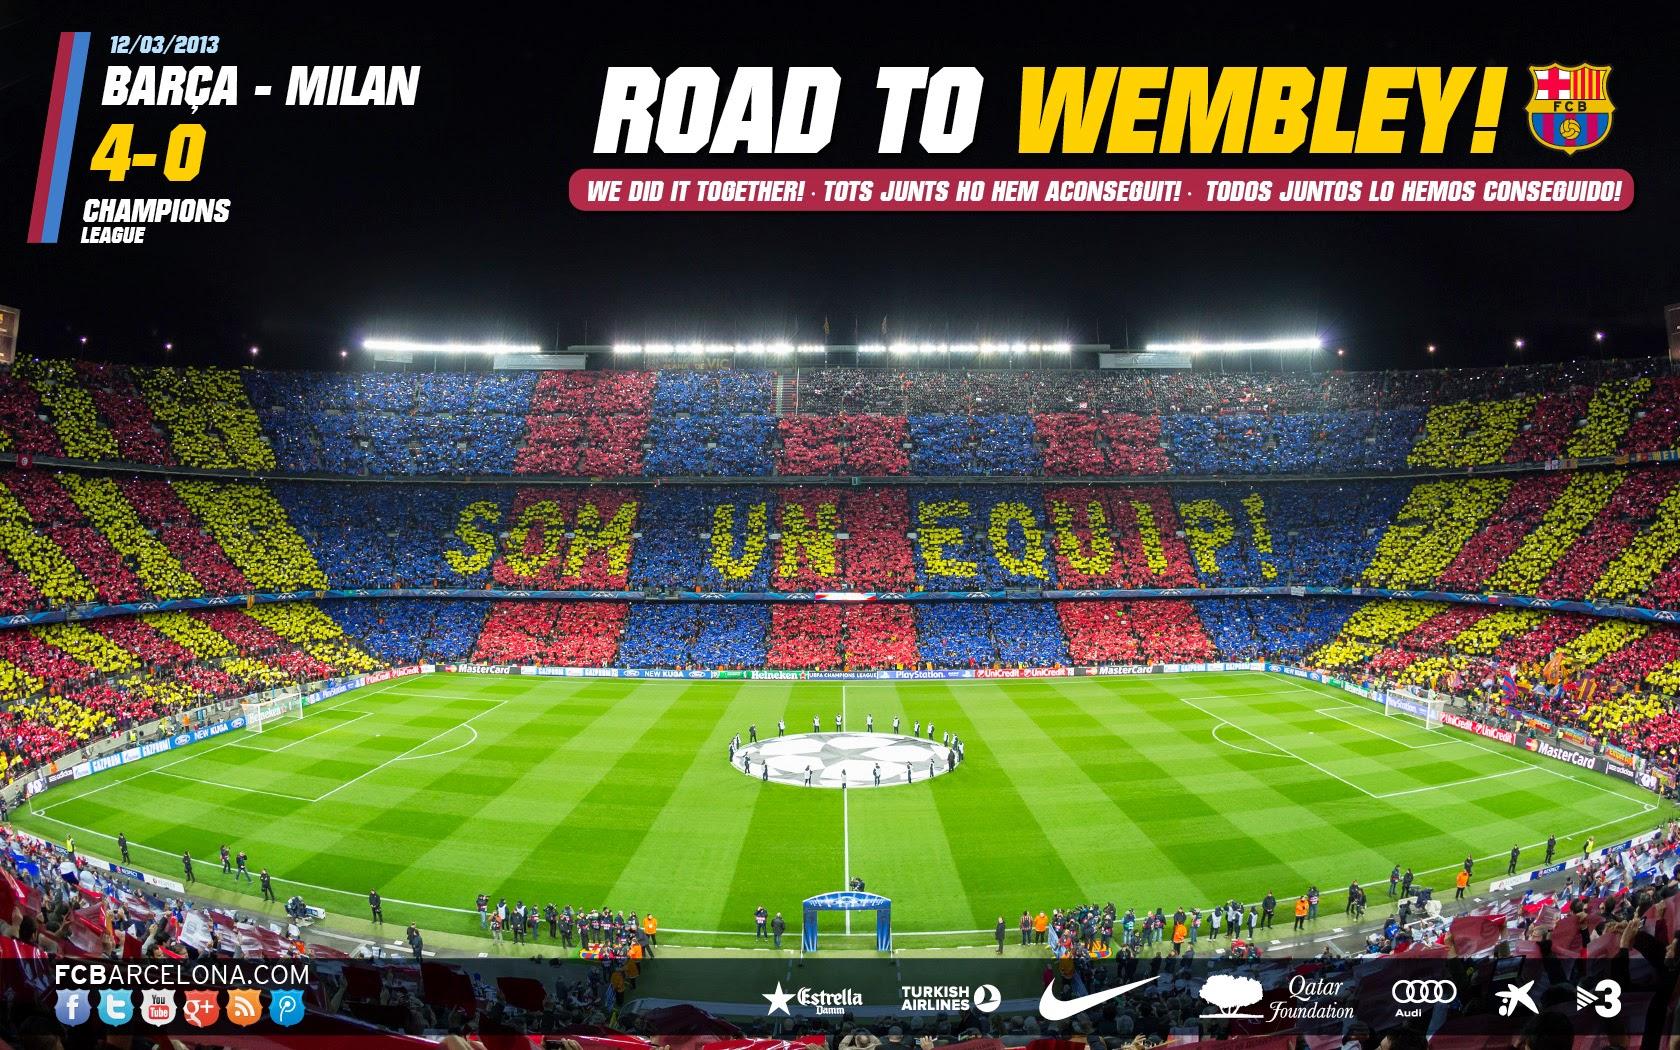 Football Wallpaper Galery Barcelona Wallpapers